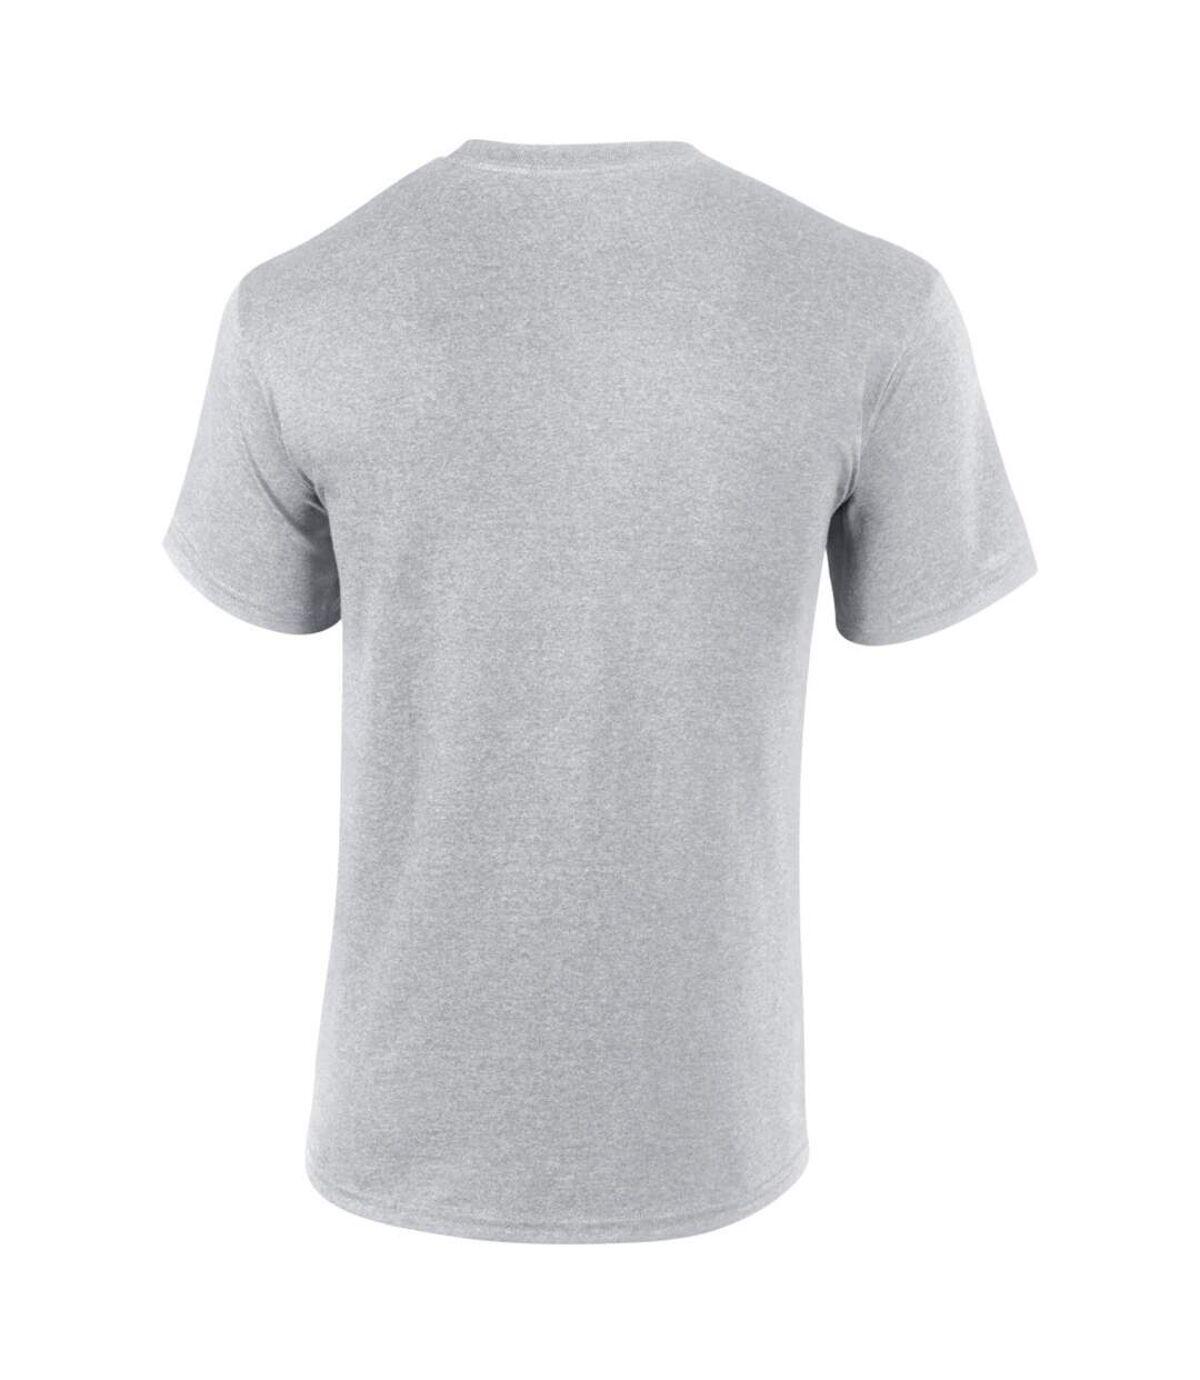 Gildan Mens Ultra Cotton Short Sleeve T-Shirt (Kiwi) - UTBC475